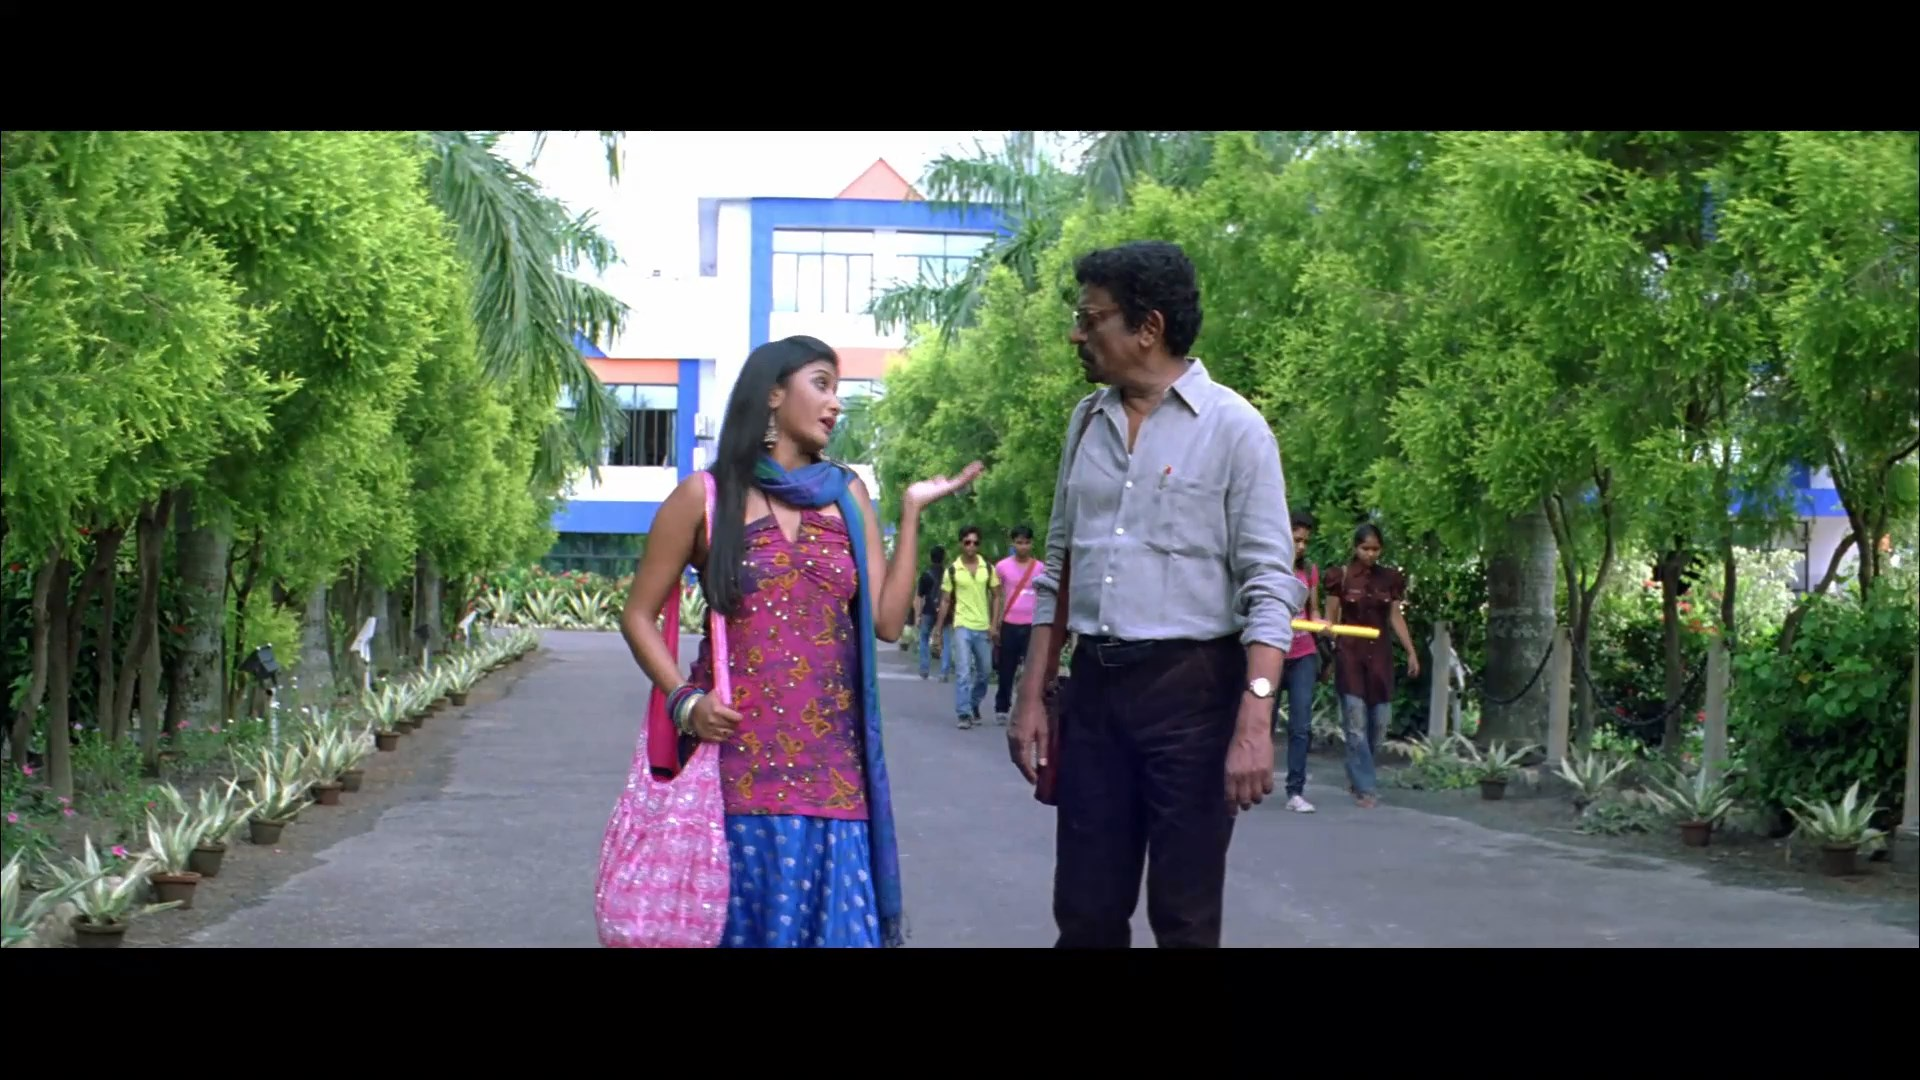 Ekla Akash 2012 Bengali 1080P WEBDL x264 AVC AAC [shadow].mp4 snapshot 00.14.33.783